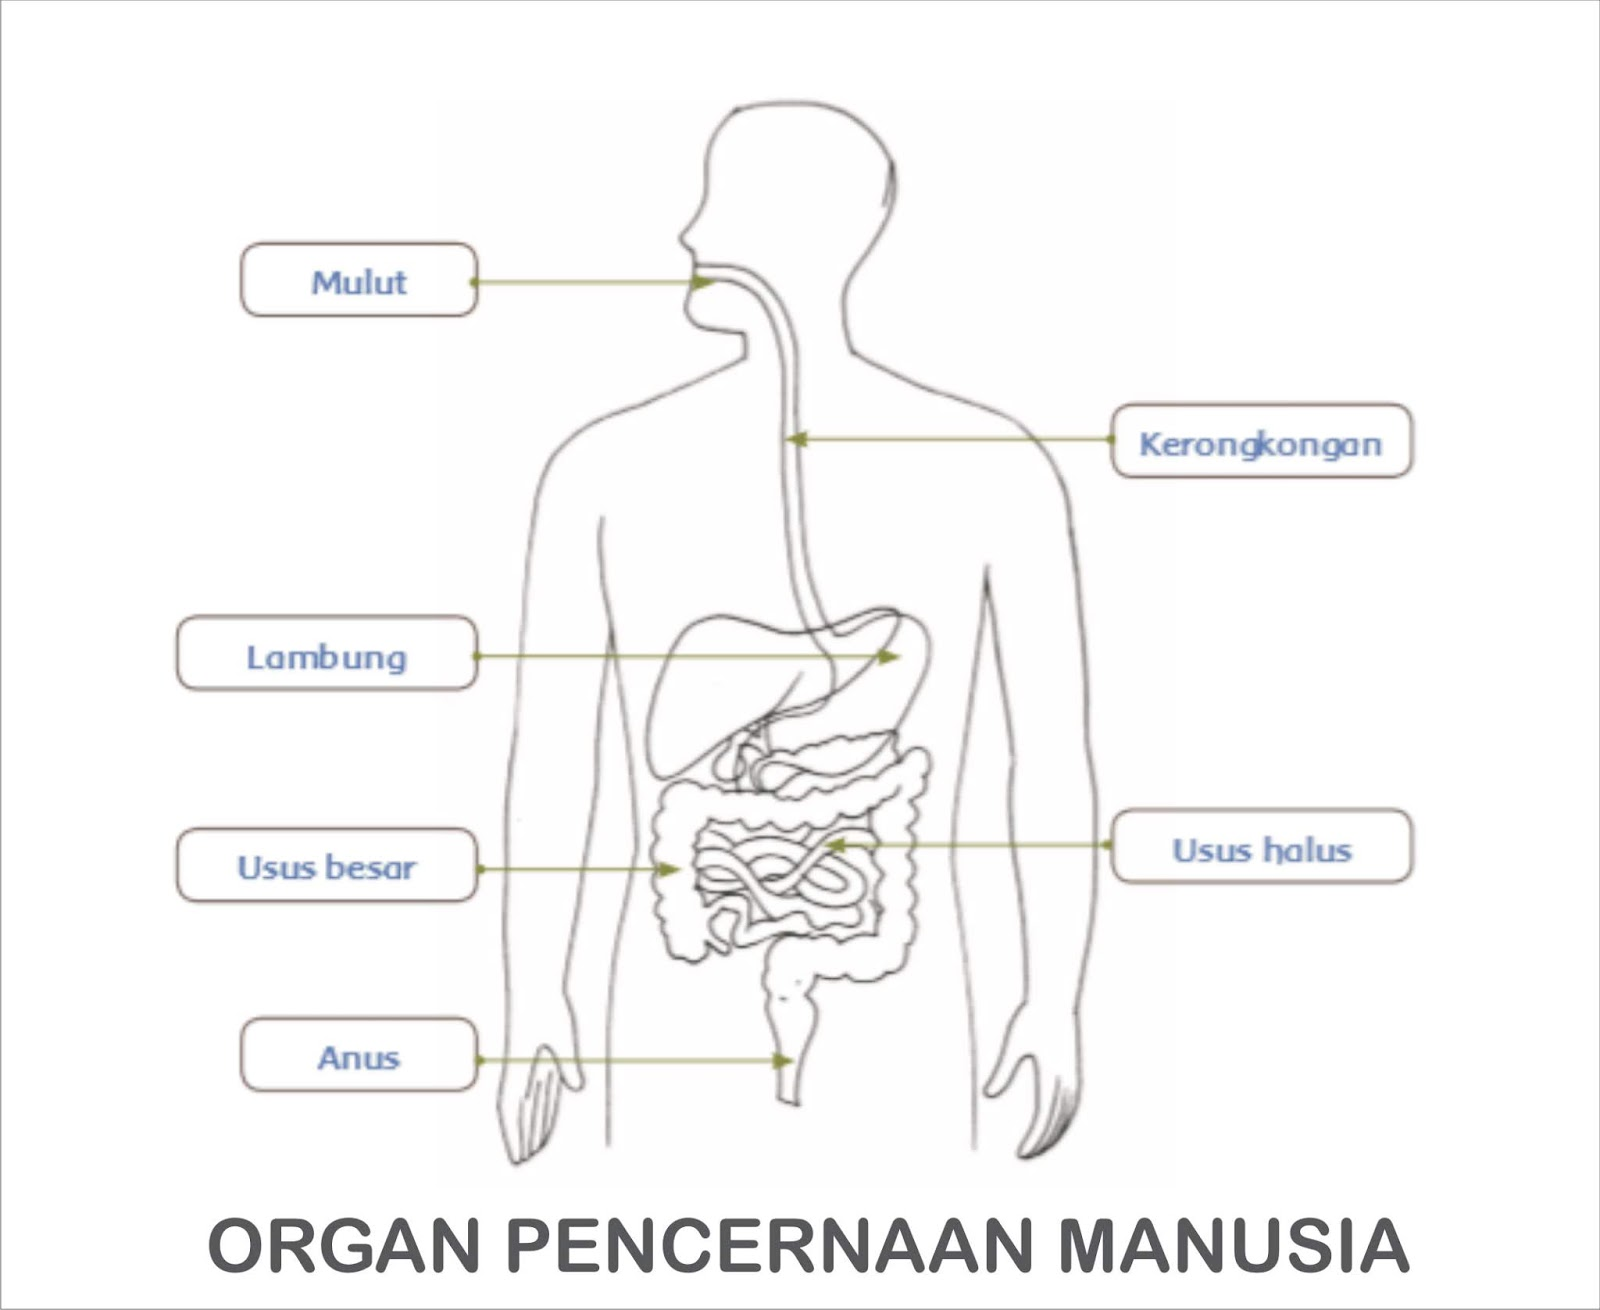 Diagram Dan Penjelasan Fungsi Organ Pencernaan Pada Manusia Gurune Net